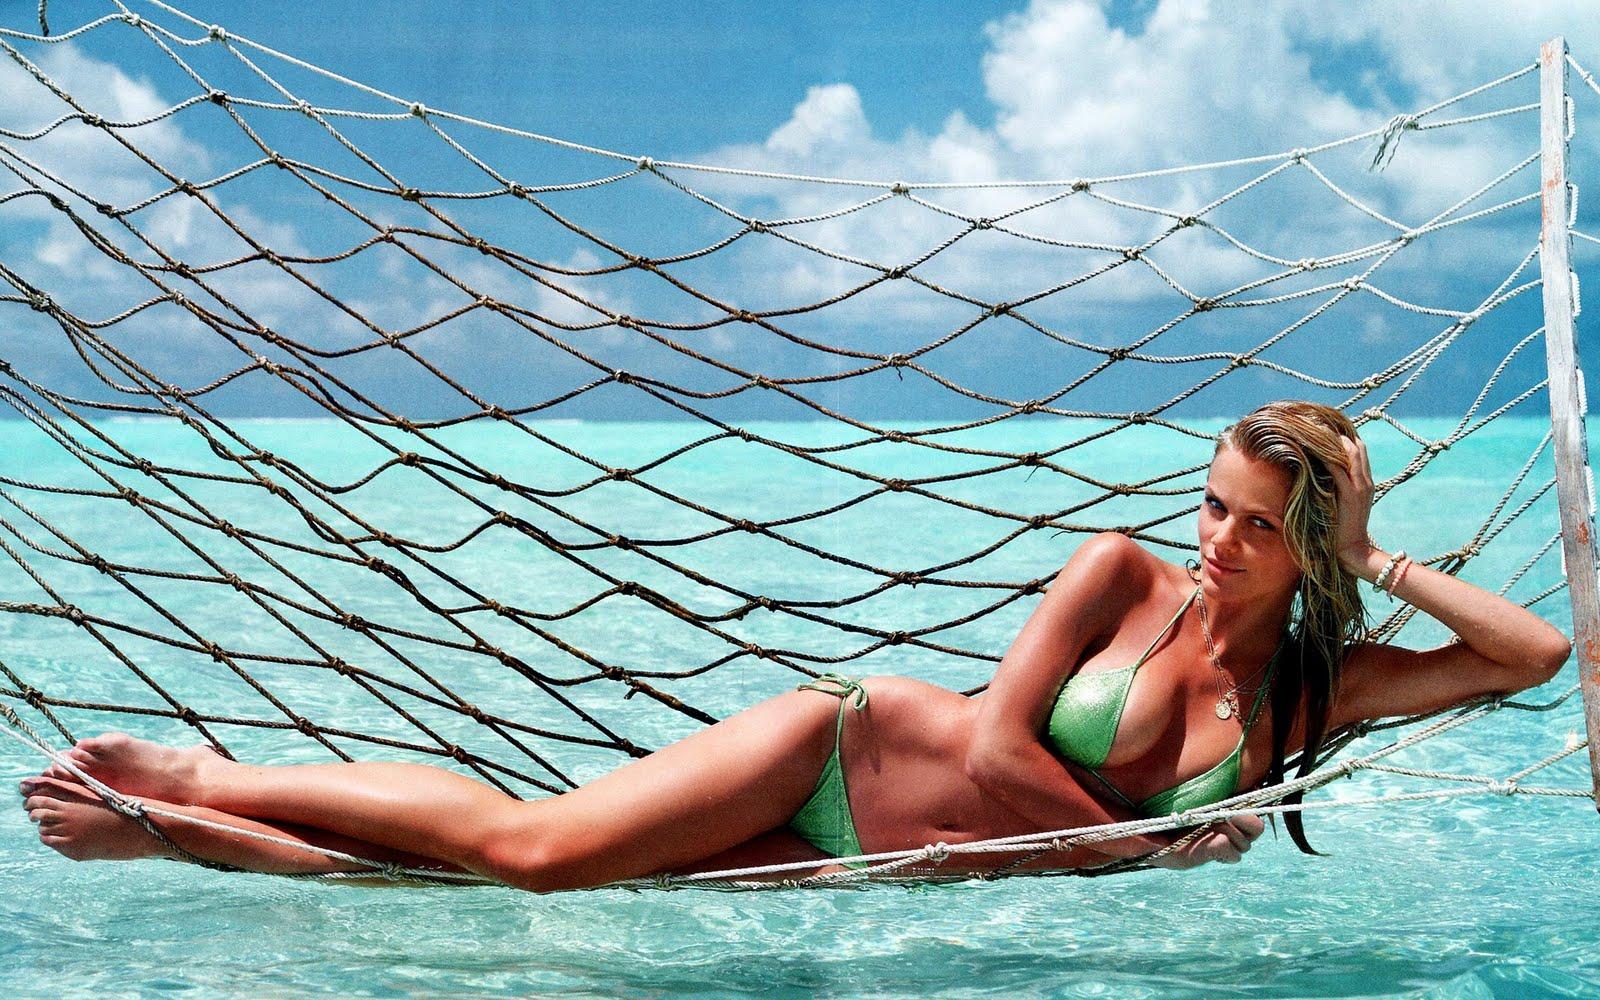 http://2.bp.blogspot.com/-_JOw8pucEB0/TW4aCFX9ZTI/AAAAAAAAGRI/ziQ9ZRJG29Q/s1600/celebskin_brooklyn_decker_cleavage_bikini_wallpaper.jpg